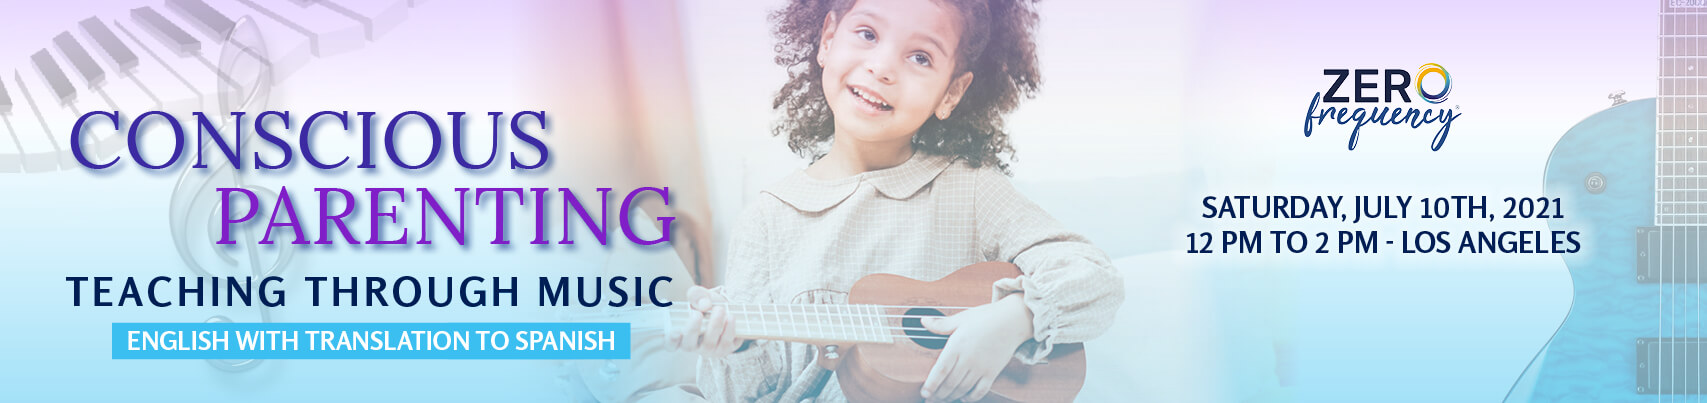 teaching-through-music-banner-2-english-with-spanish-translation